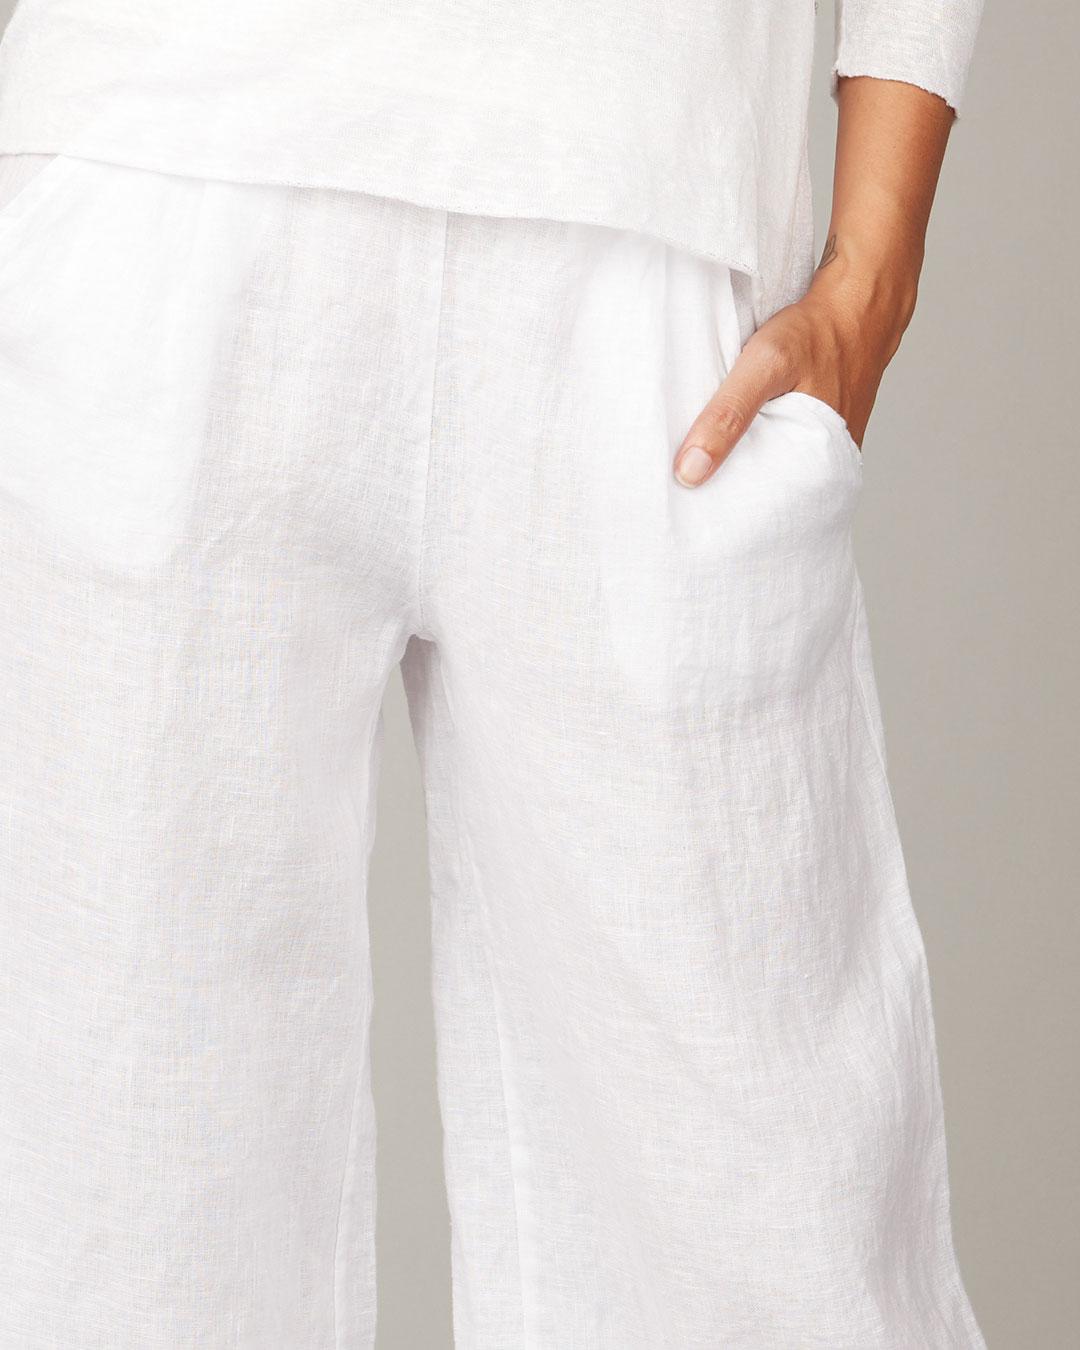 pistache-clothing-relaxed-linen-pant-white-dianes-lingerie-vancouver-1080x1080